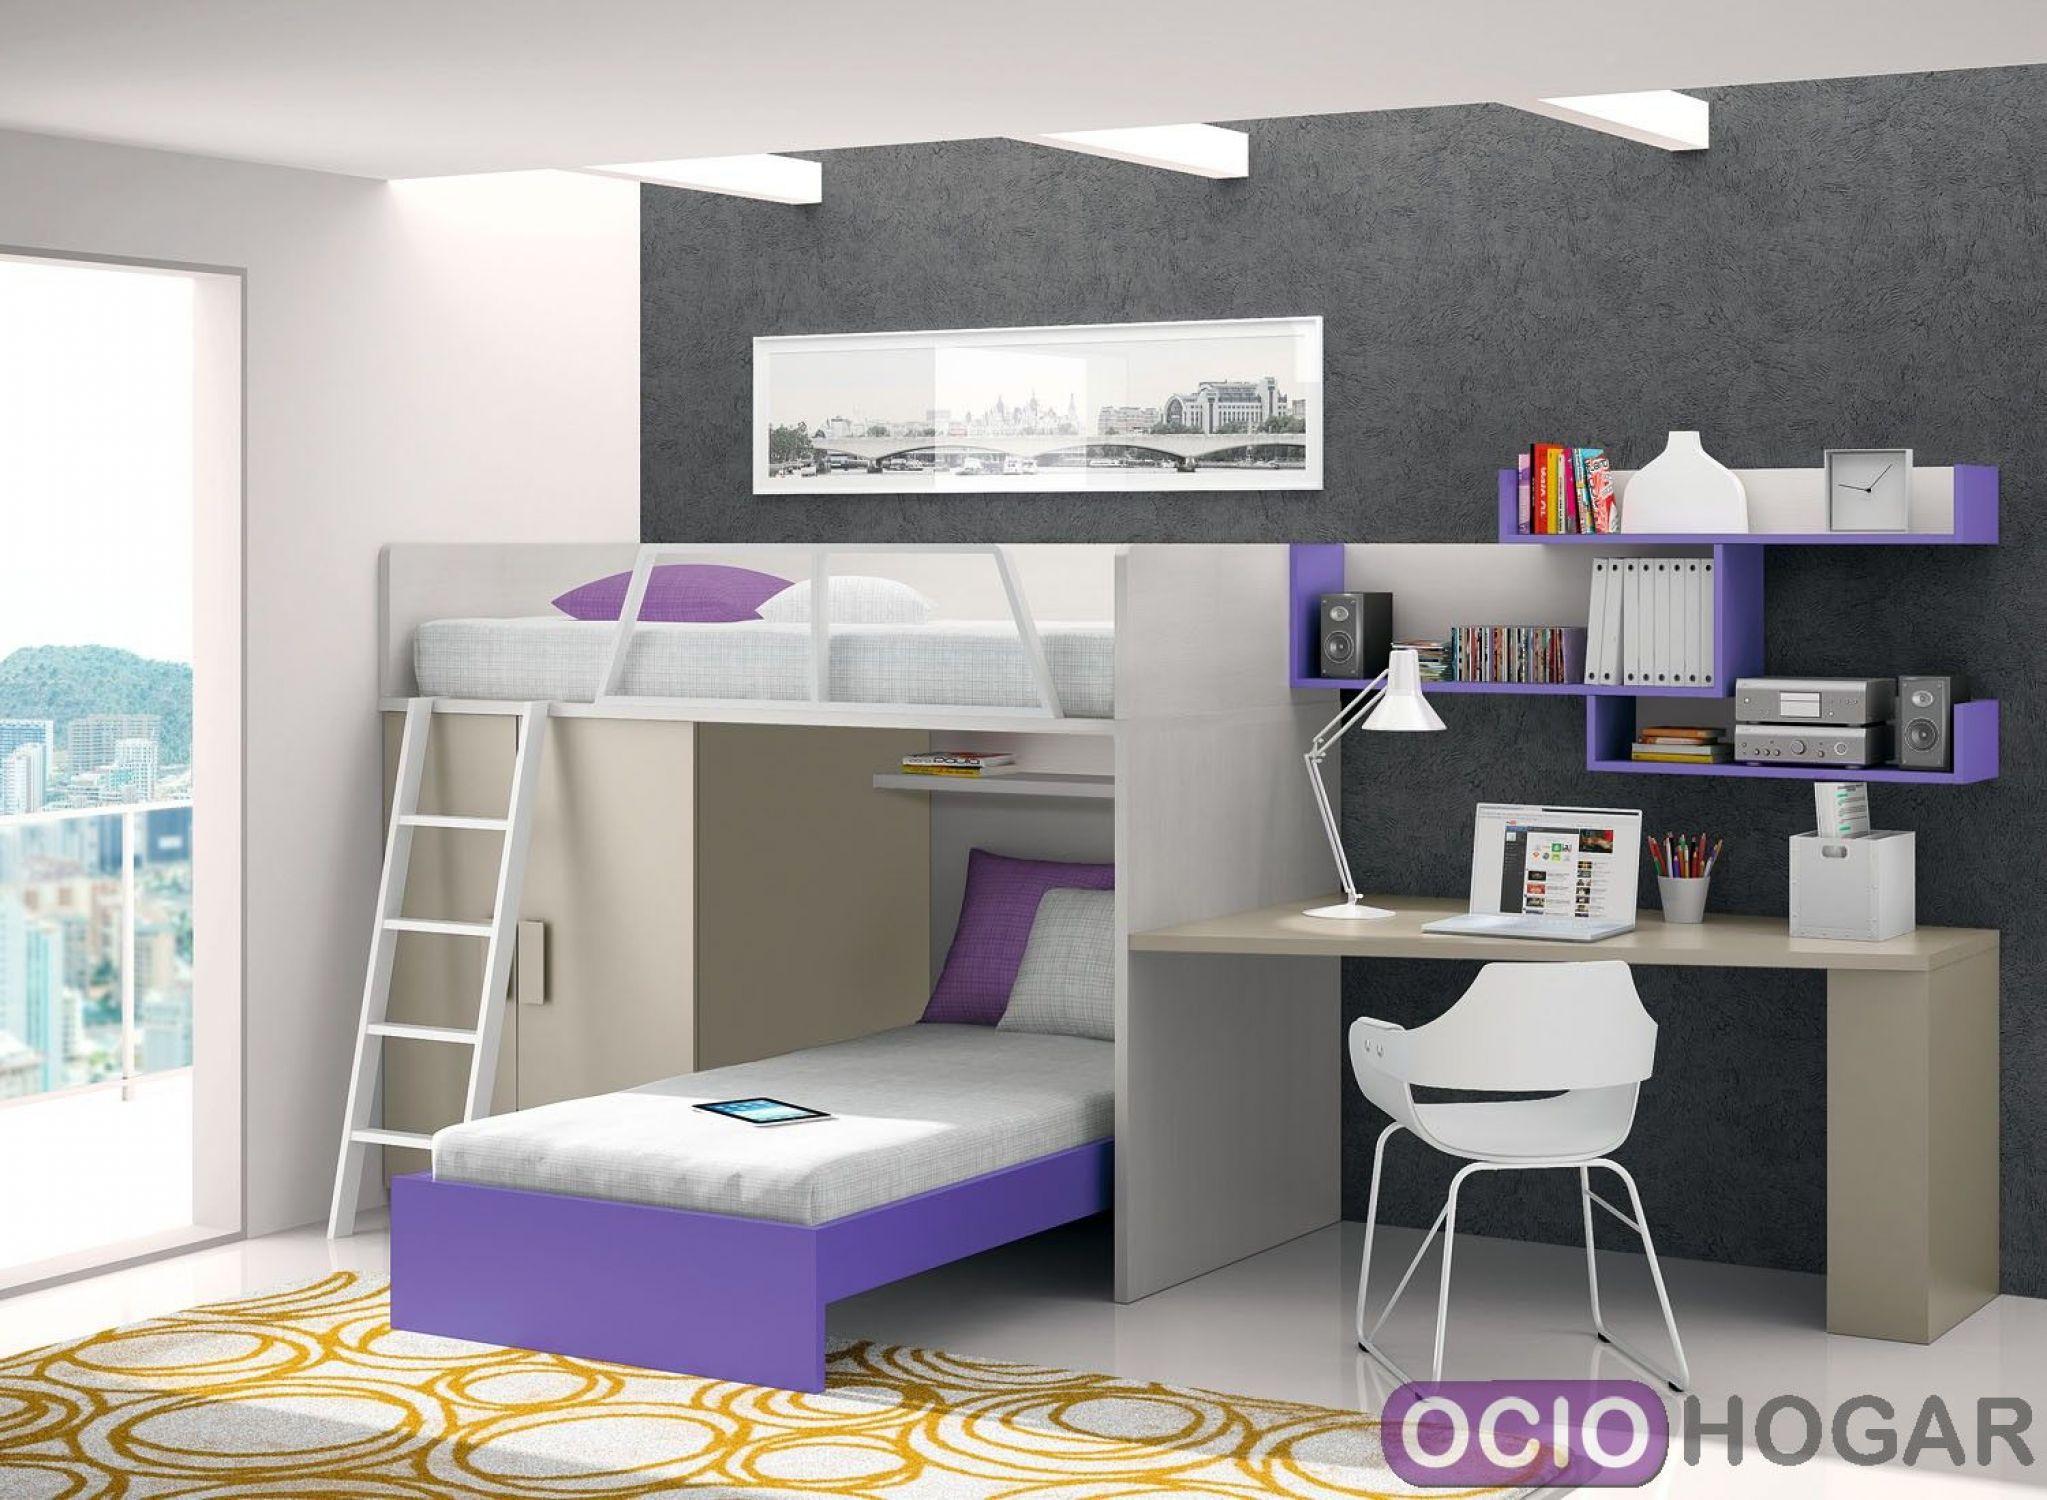 Dormitorio Juvenil Violet De Dissery Muebles Infantiles